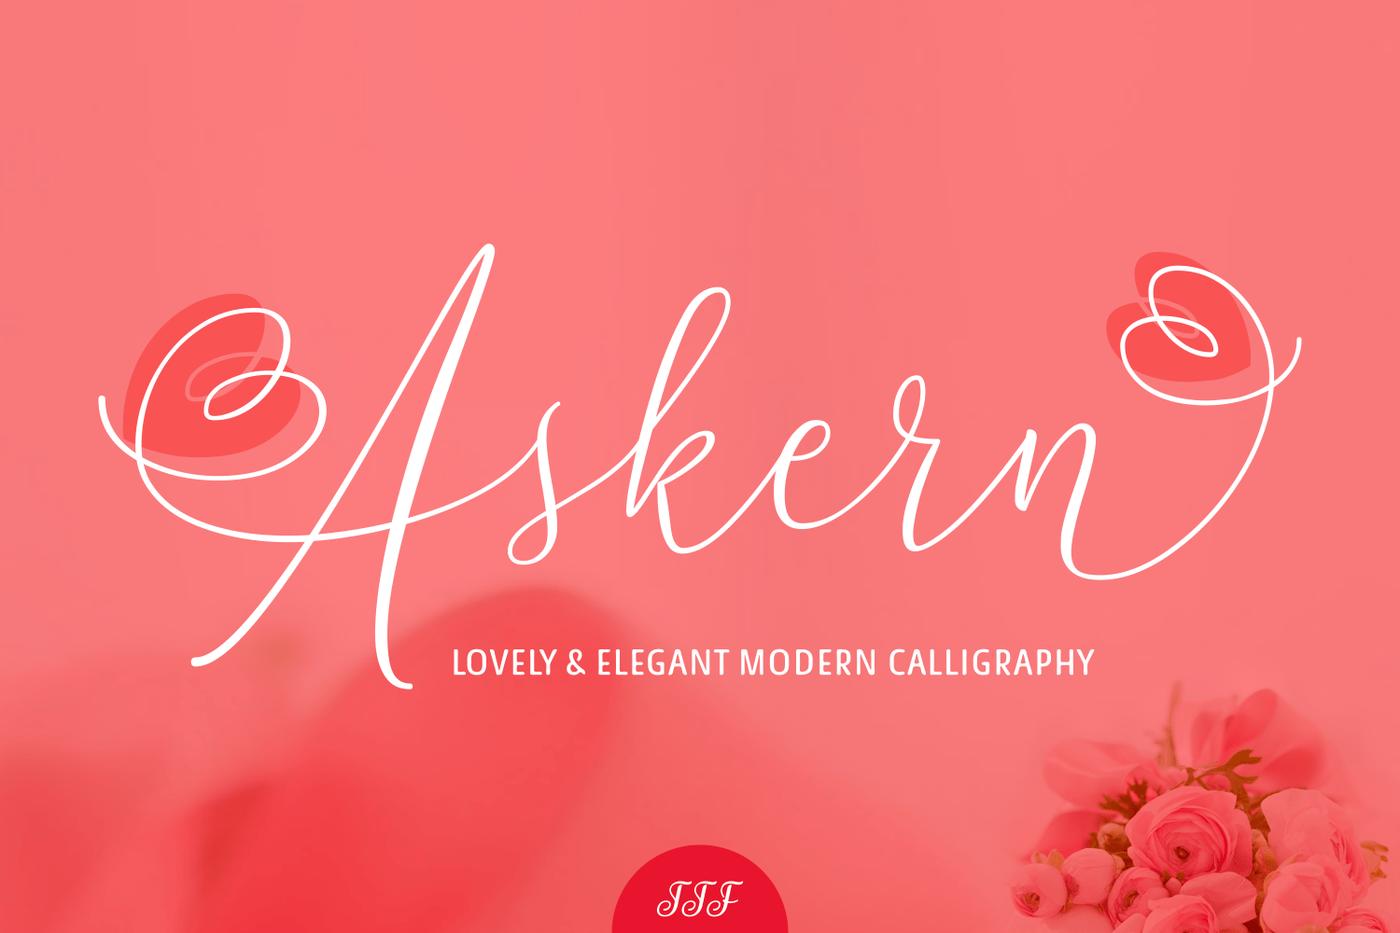 013_Askern_Beautiful_Brush_Script_Hand_Drawn_Font